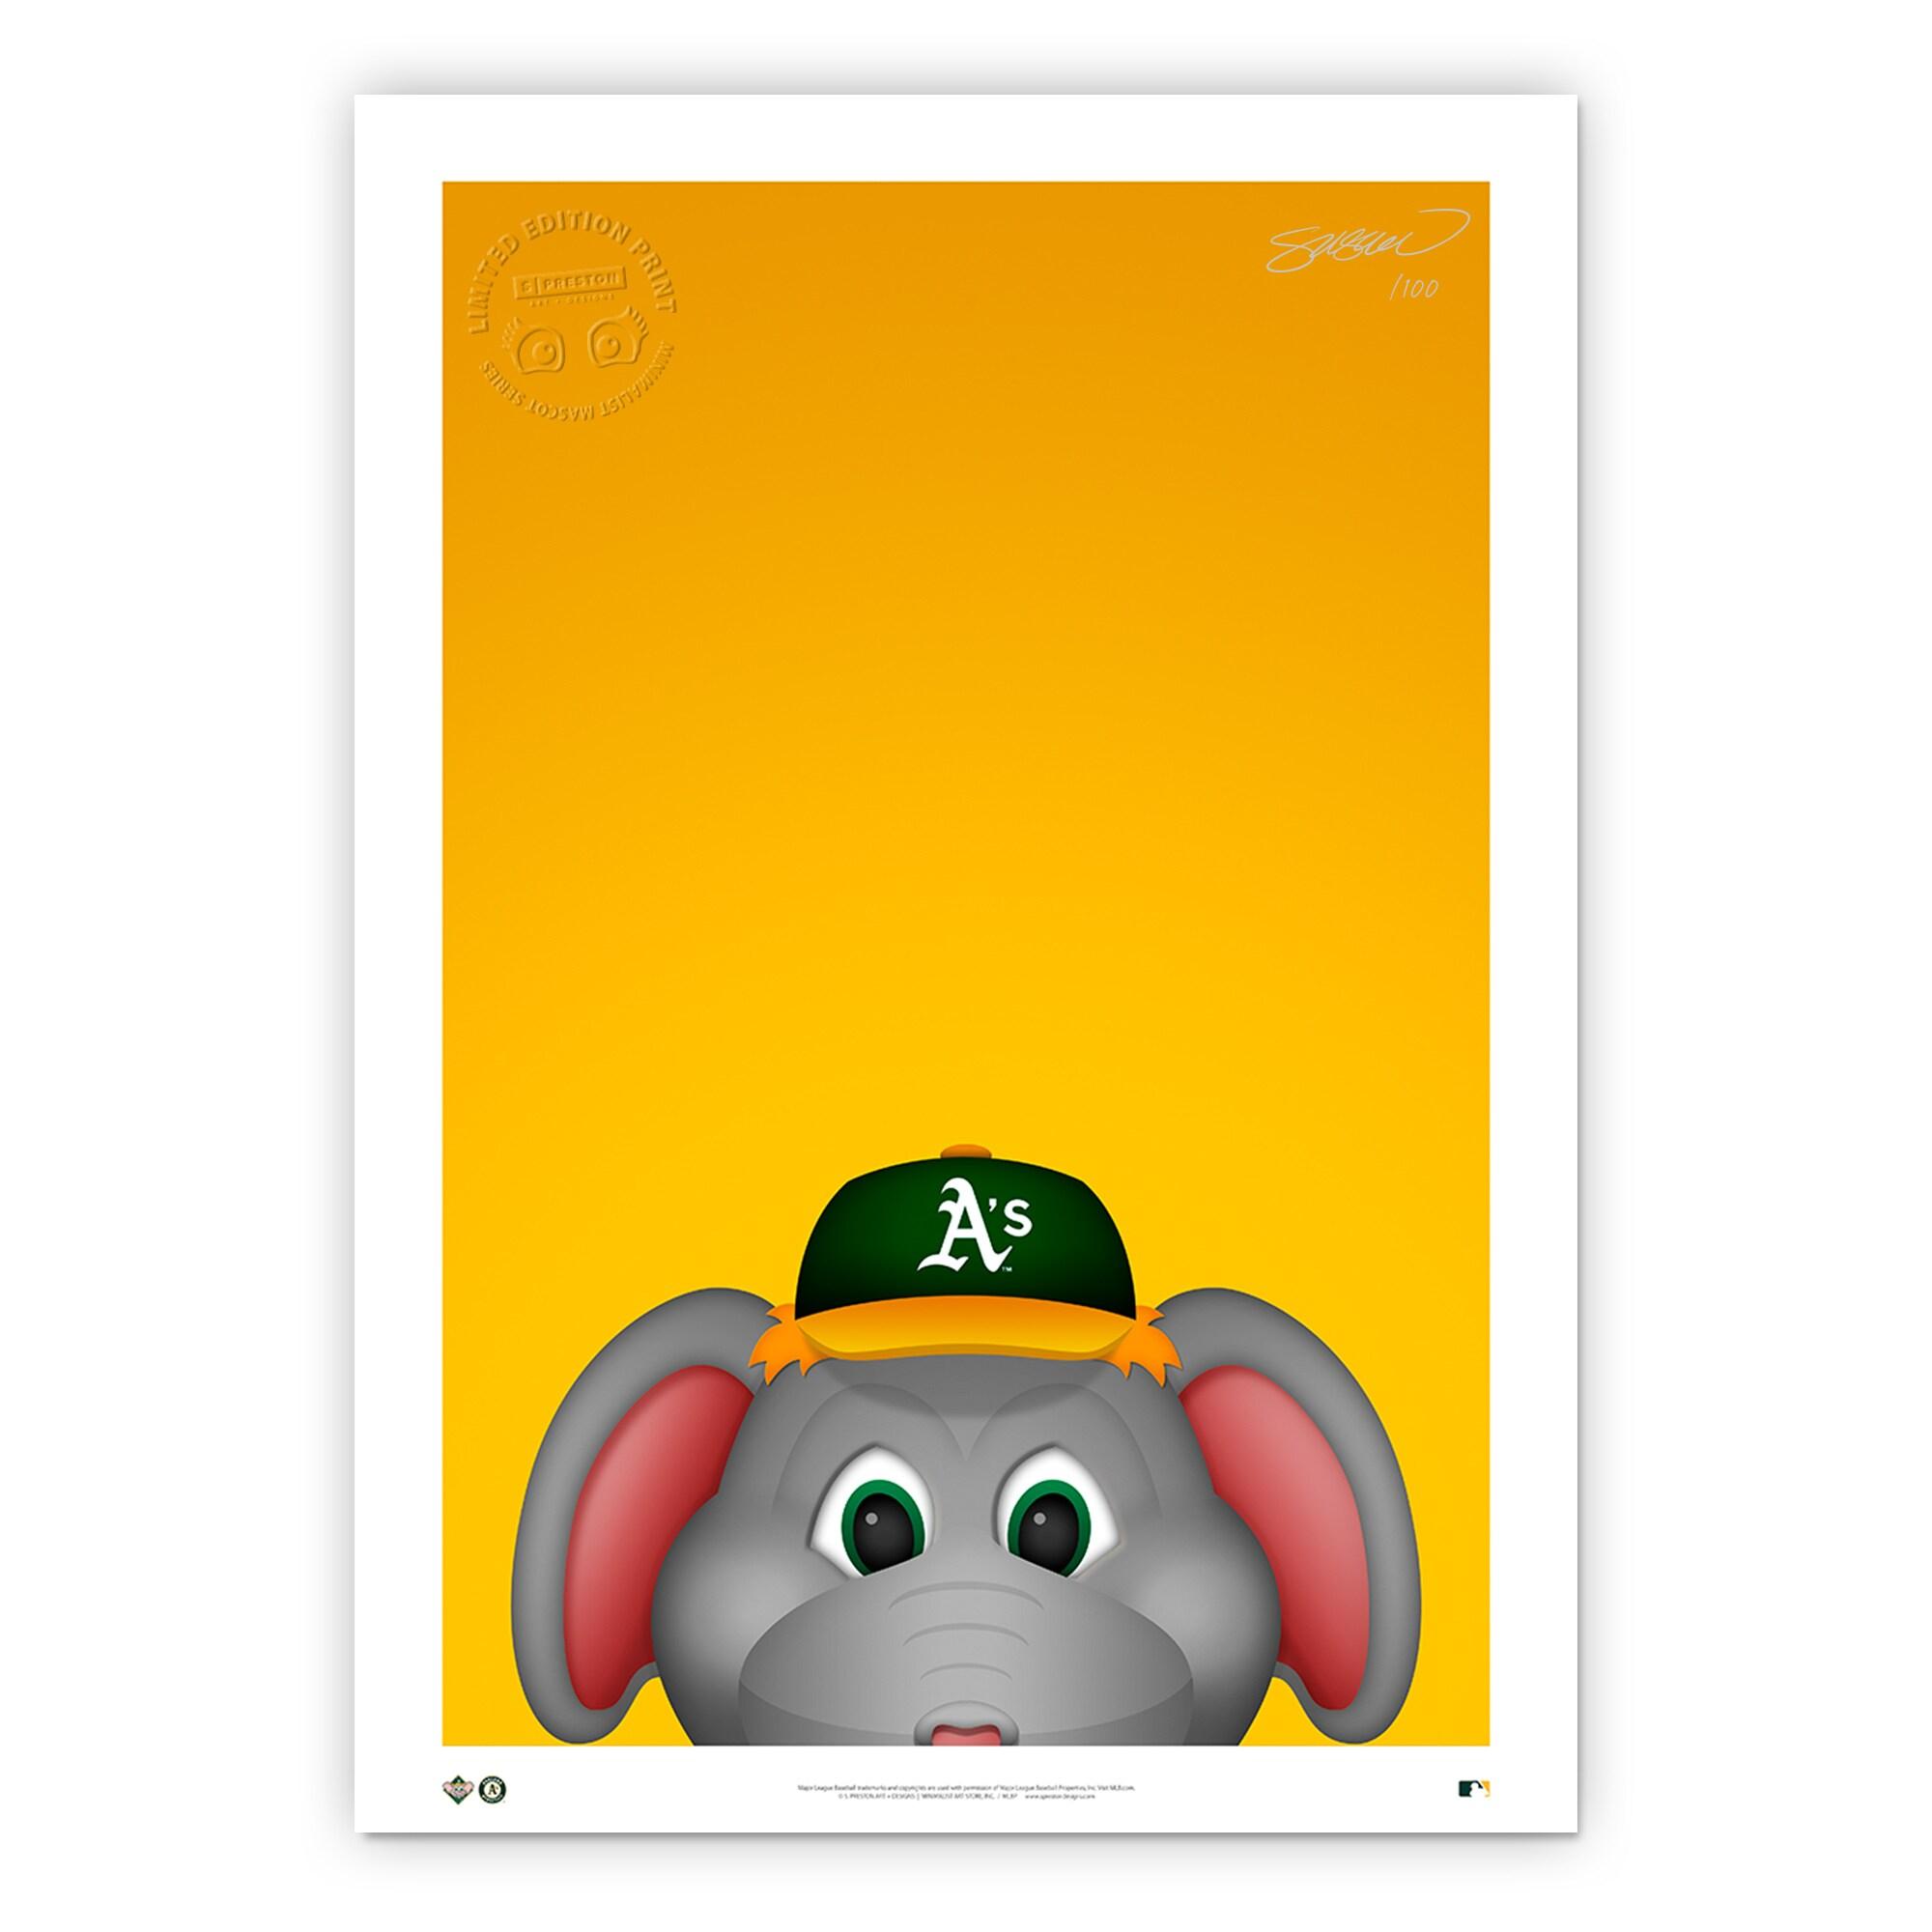 "Oakland Athletics 24"" x 32"" Minimalist Oakland Athletics Mascot Wall Art"